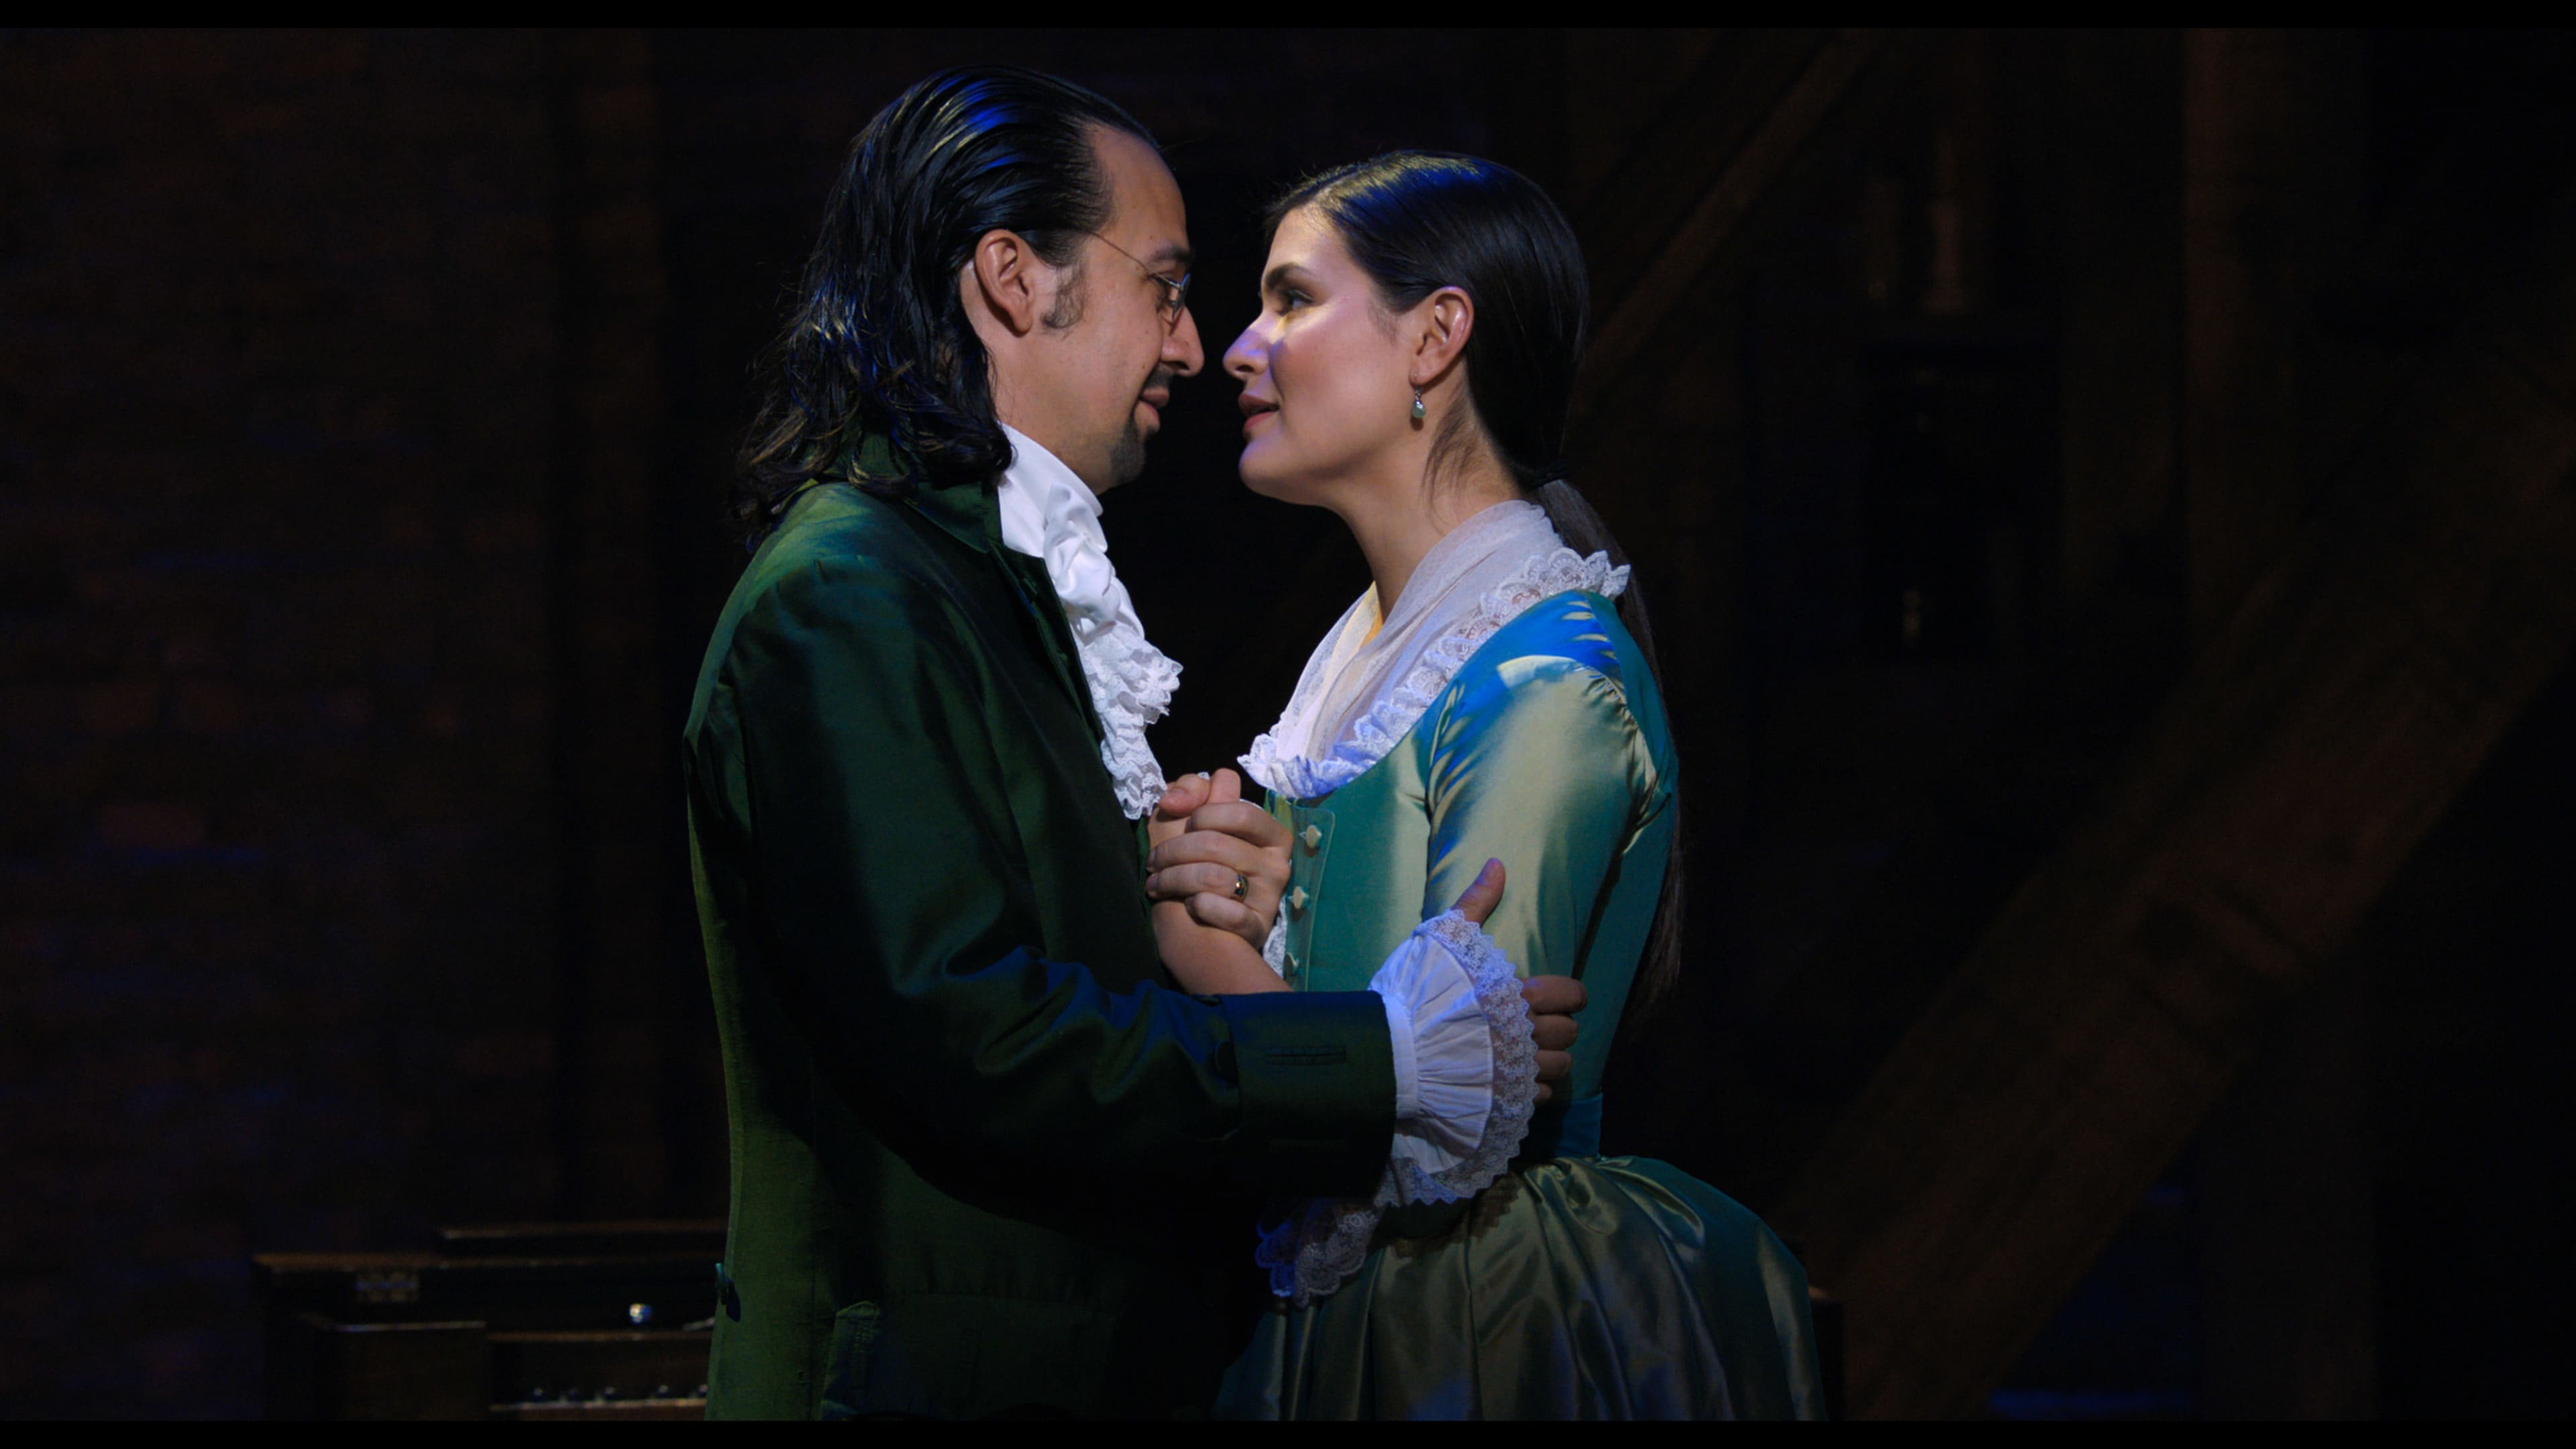 Lin-Manuel Miranda is Alexander Hamilton and Phillipa Soo is Eliza Hamilton in HAMILTON, the filmed version of the original Broadway production.